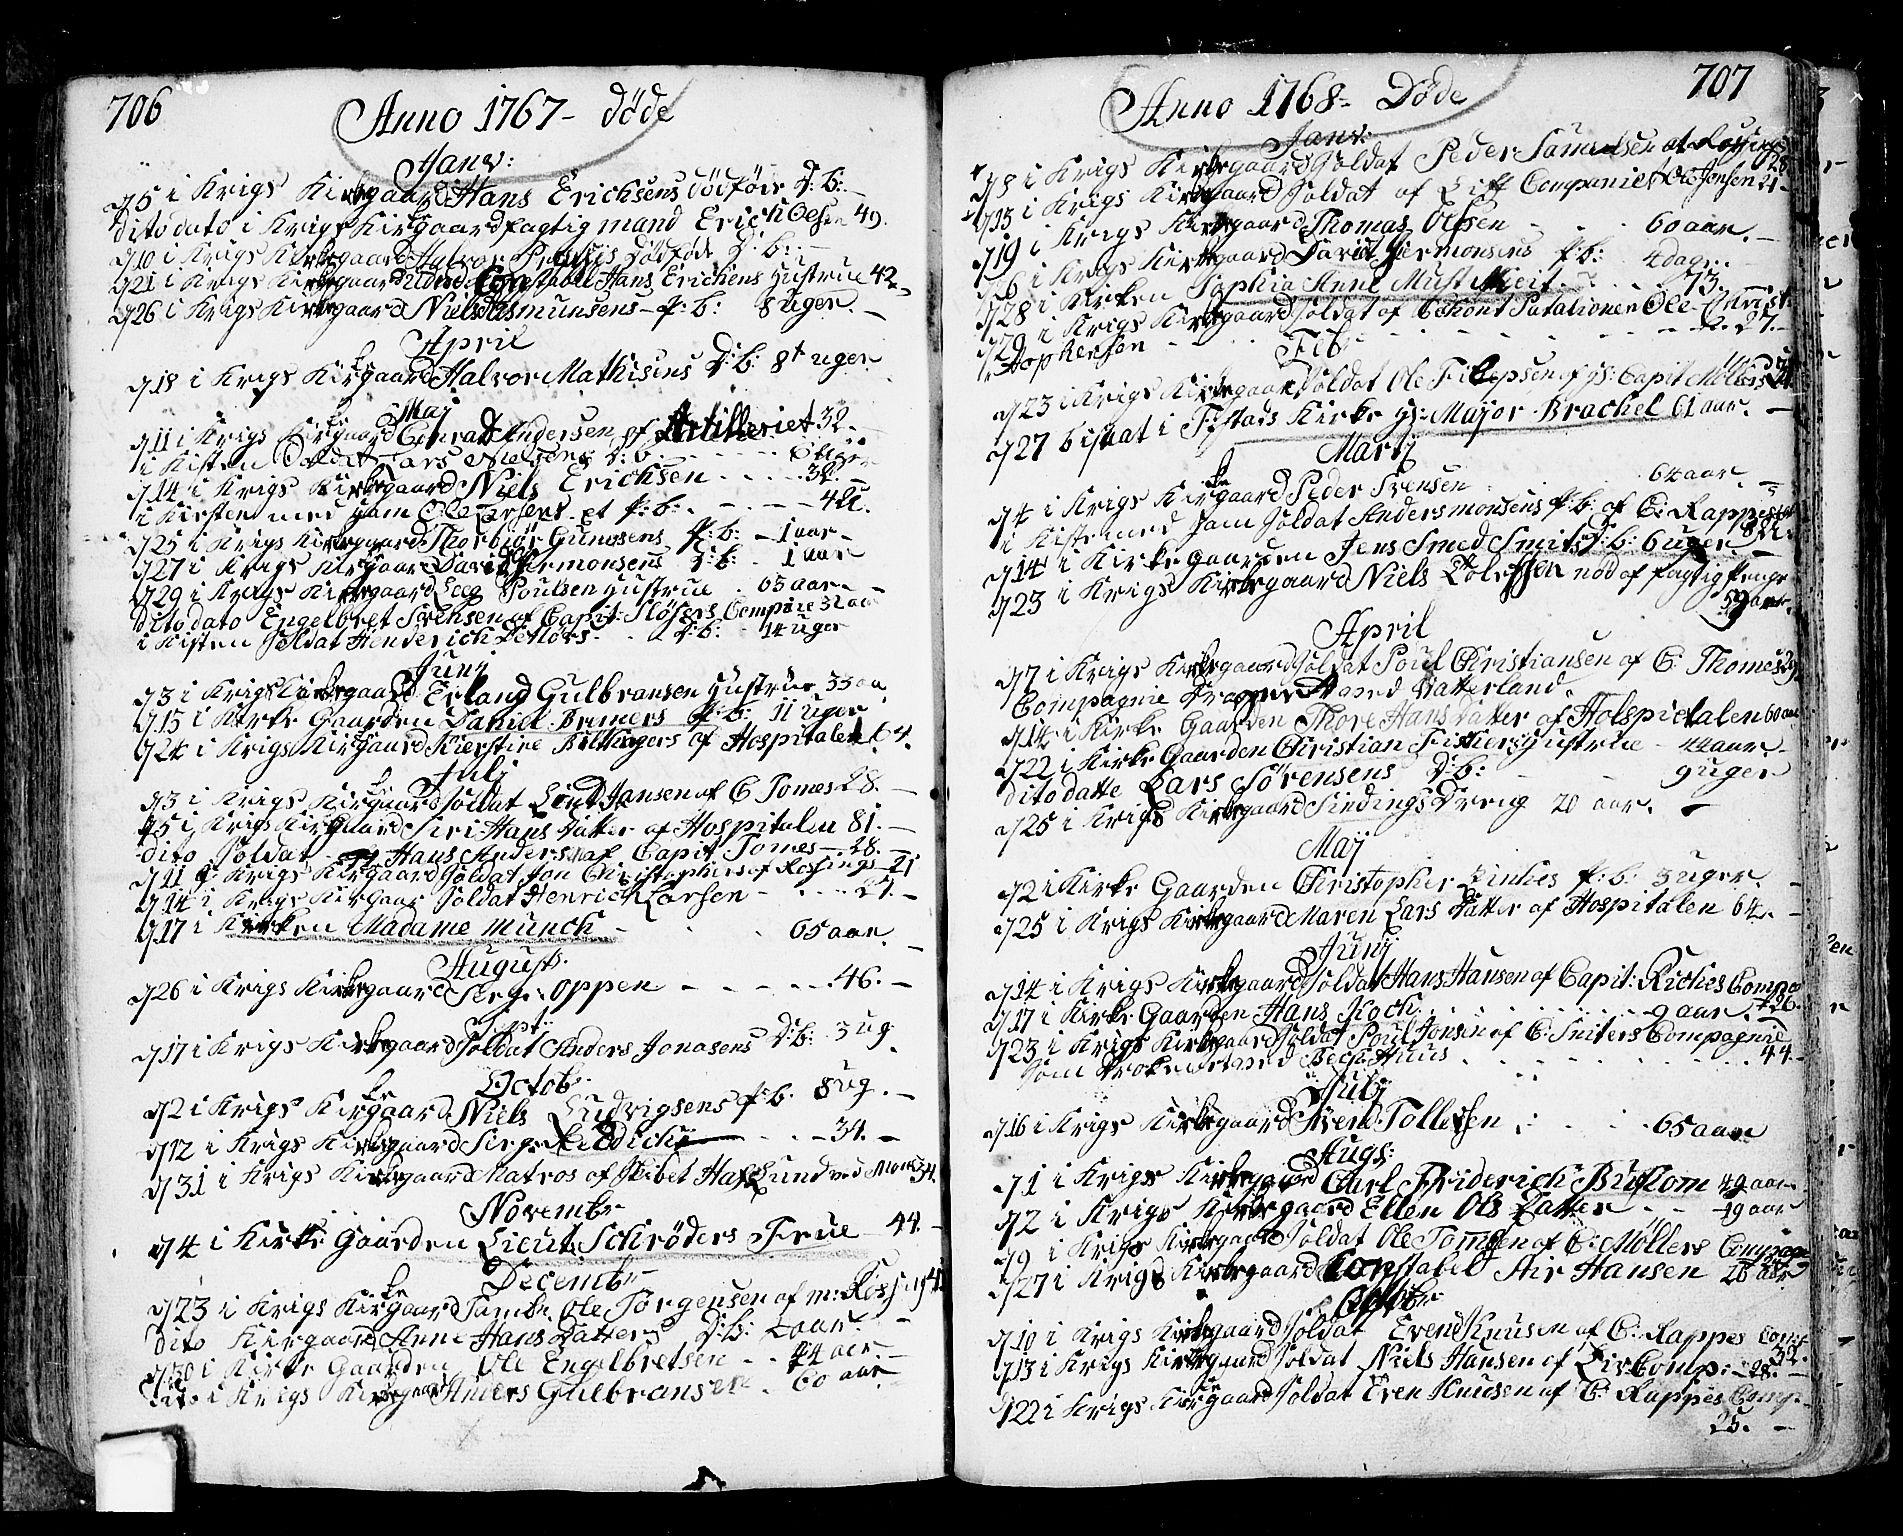 SAO, Fredrikstad prestekontor Kirkebøker, F/Fa/L0002: Ministerialbok nr. 2, 1750-1804, s. 706-707